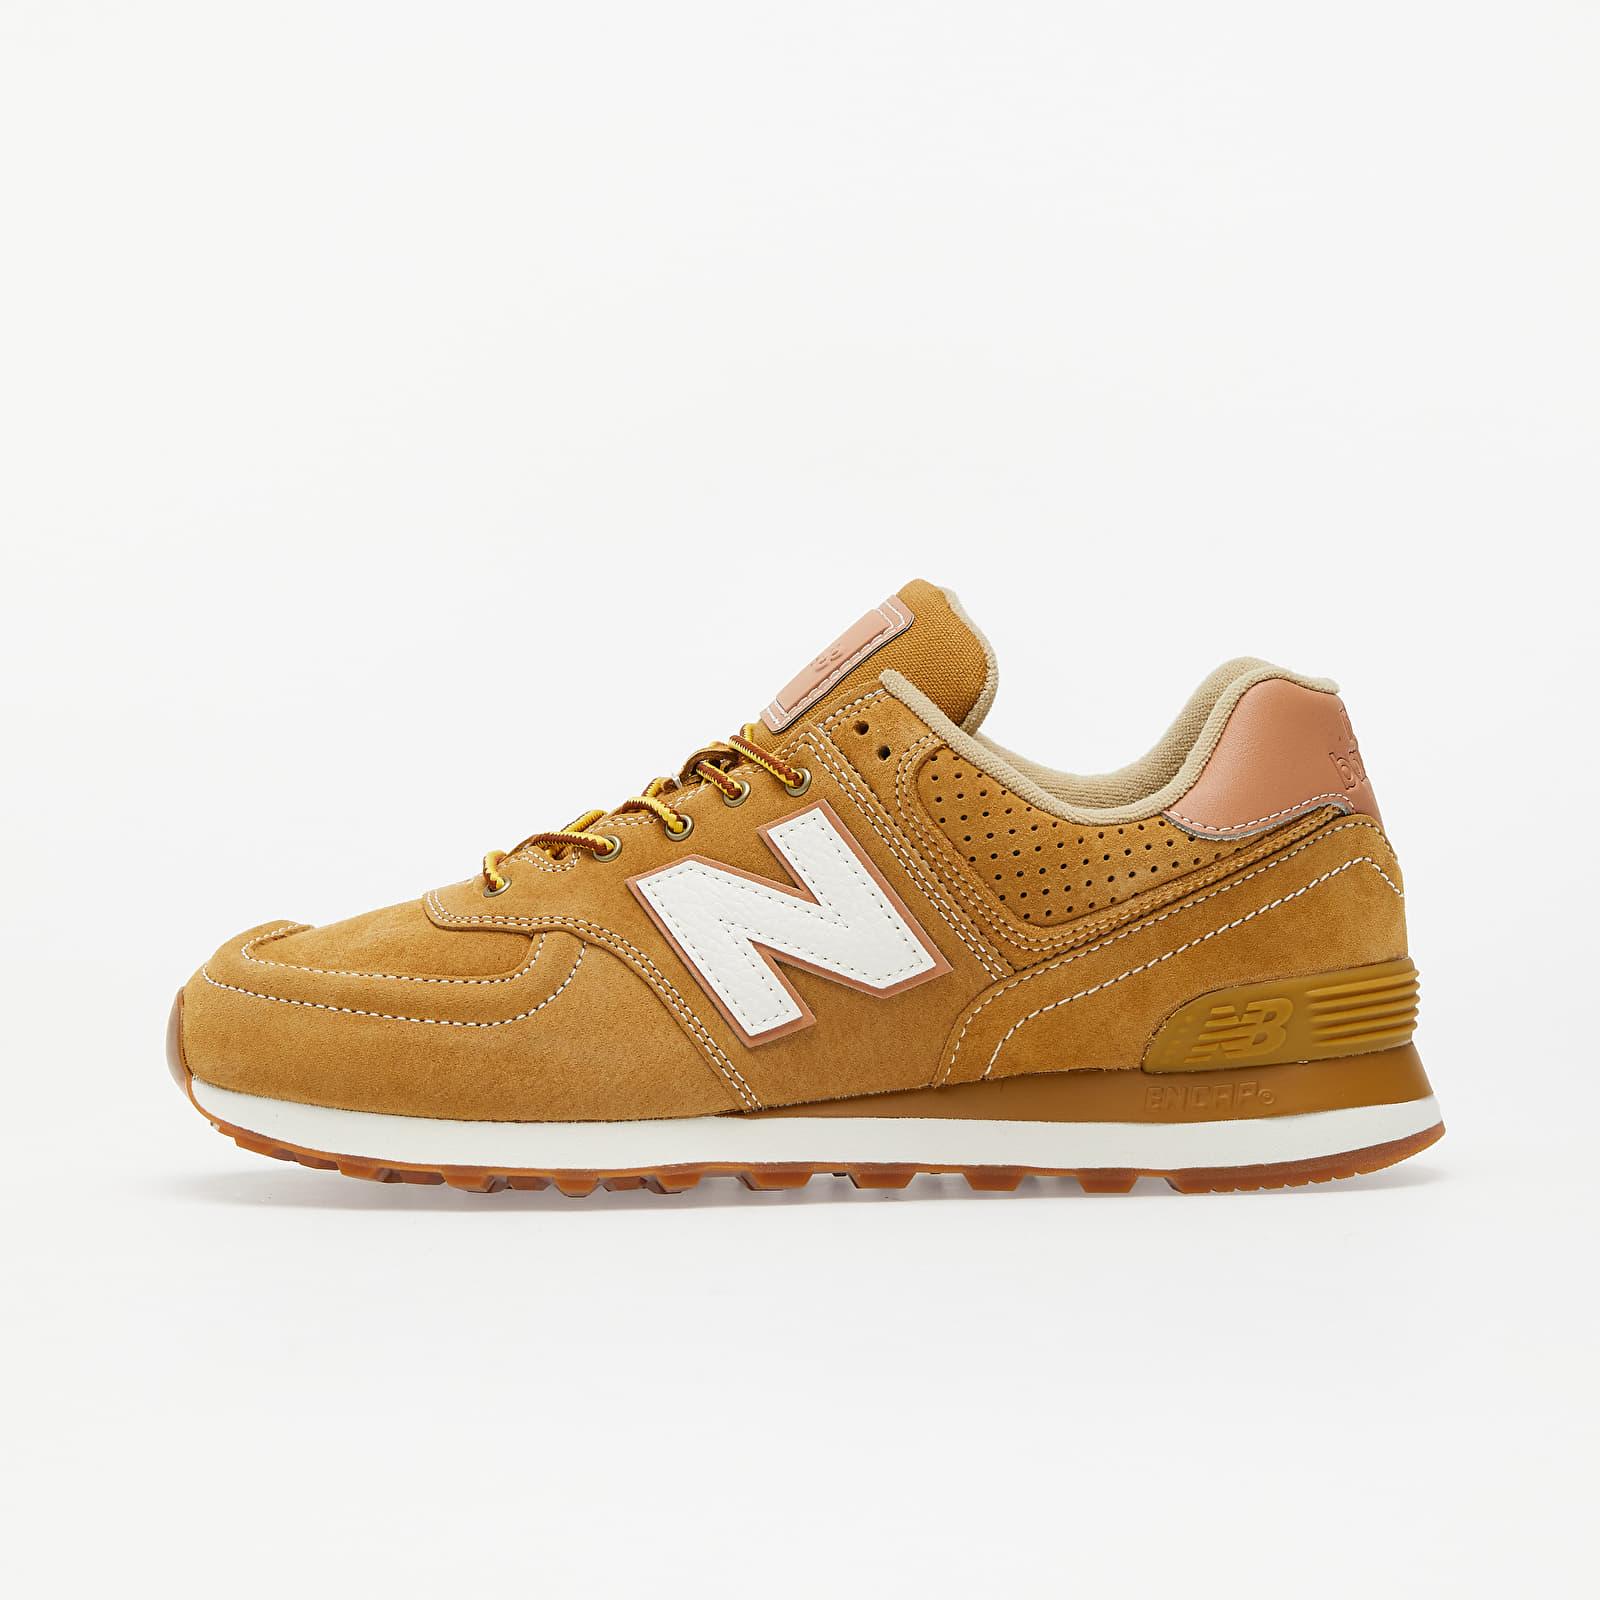 New Balance 574 Brown/ White EUR 42